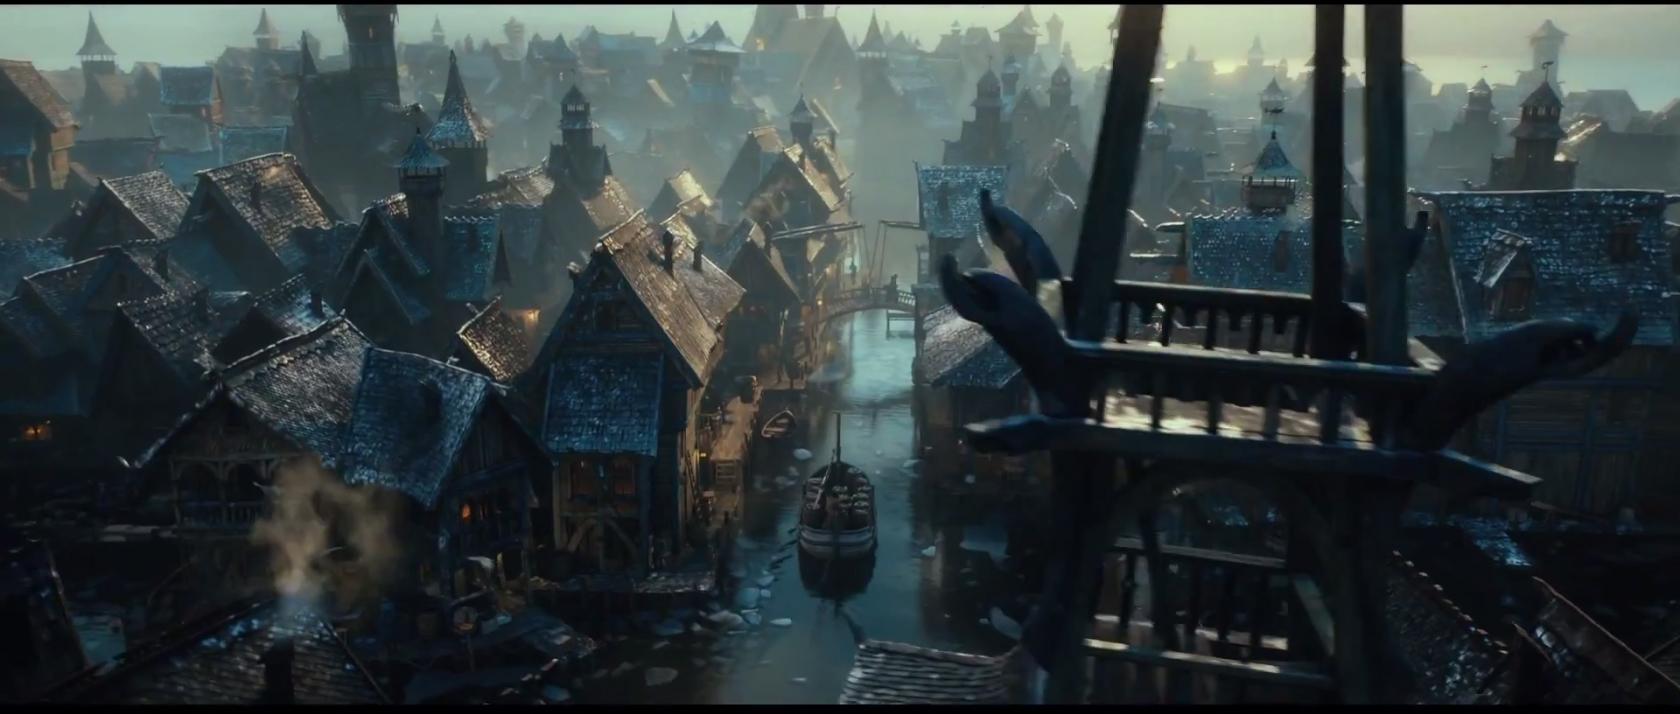 https://rickihobson.files.wordpress.com/2013/12/the-hobbit-the-desolation-of-smaug-lake-town.jpg